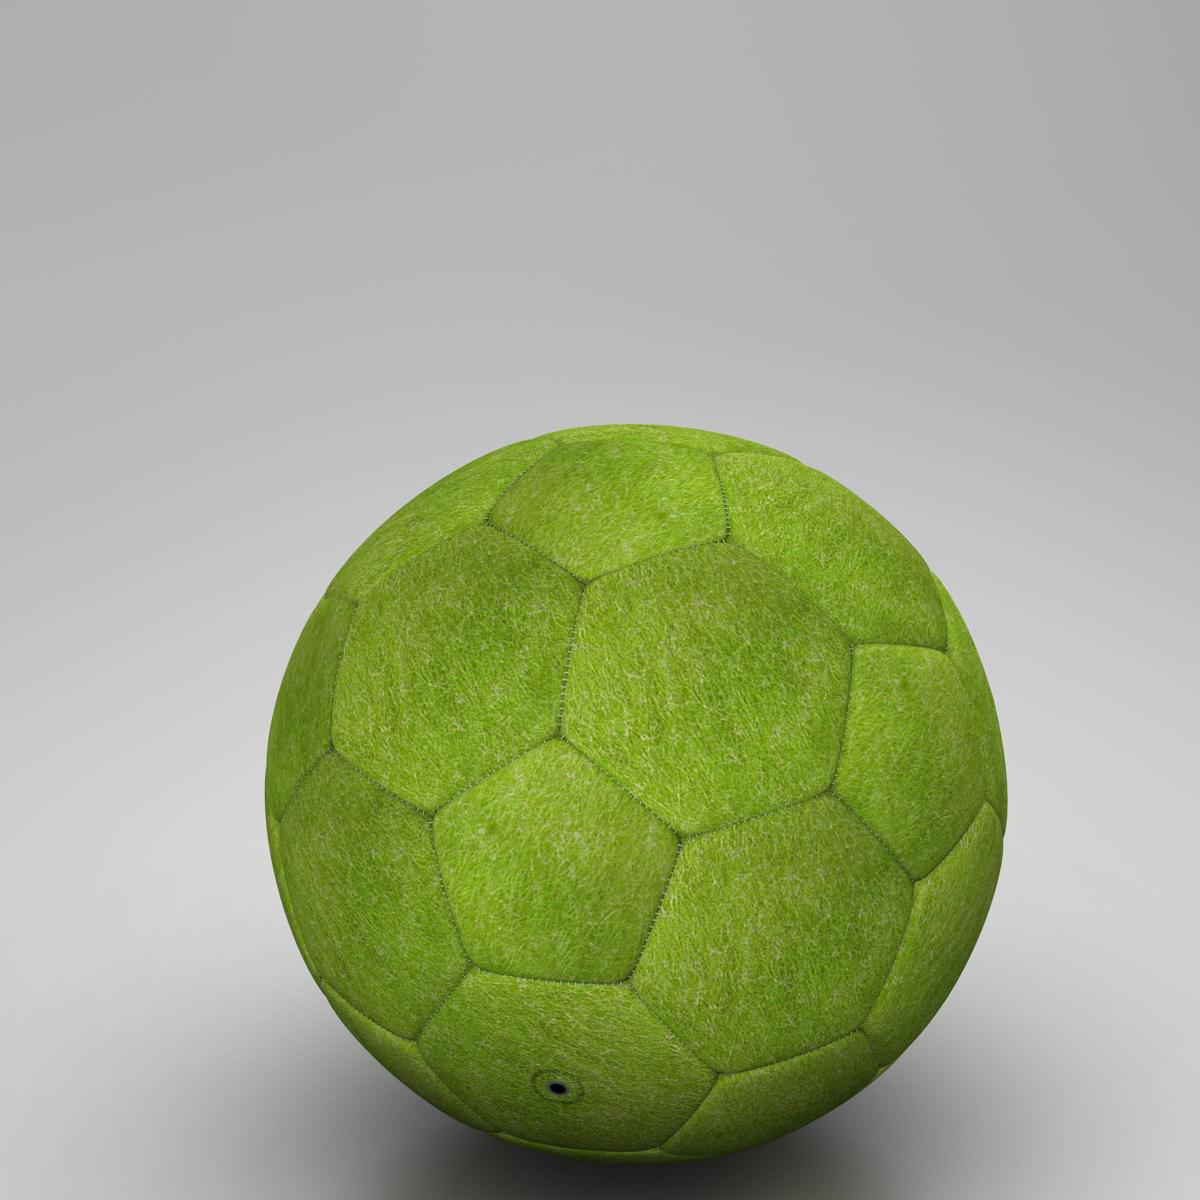 soccerball дотроо 3d загвар 3ds max fbx c4d м mb obj 205144